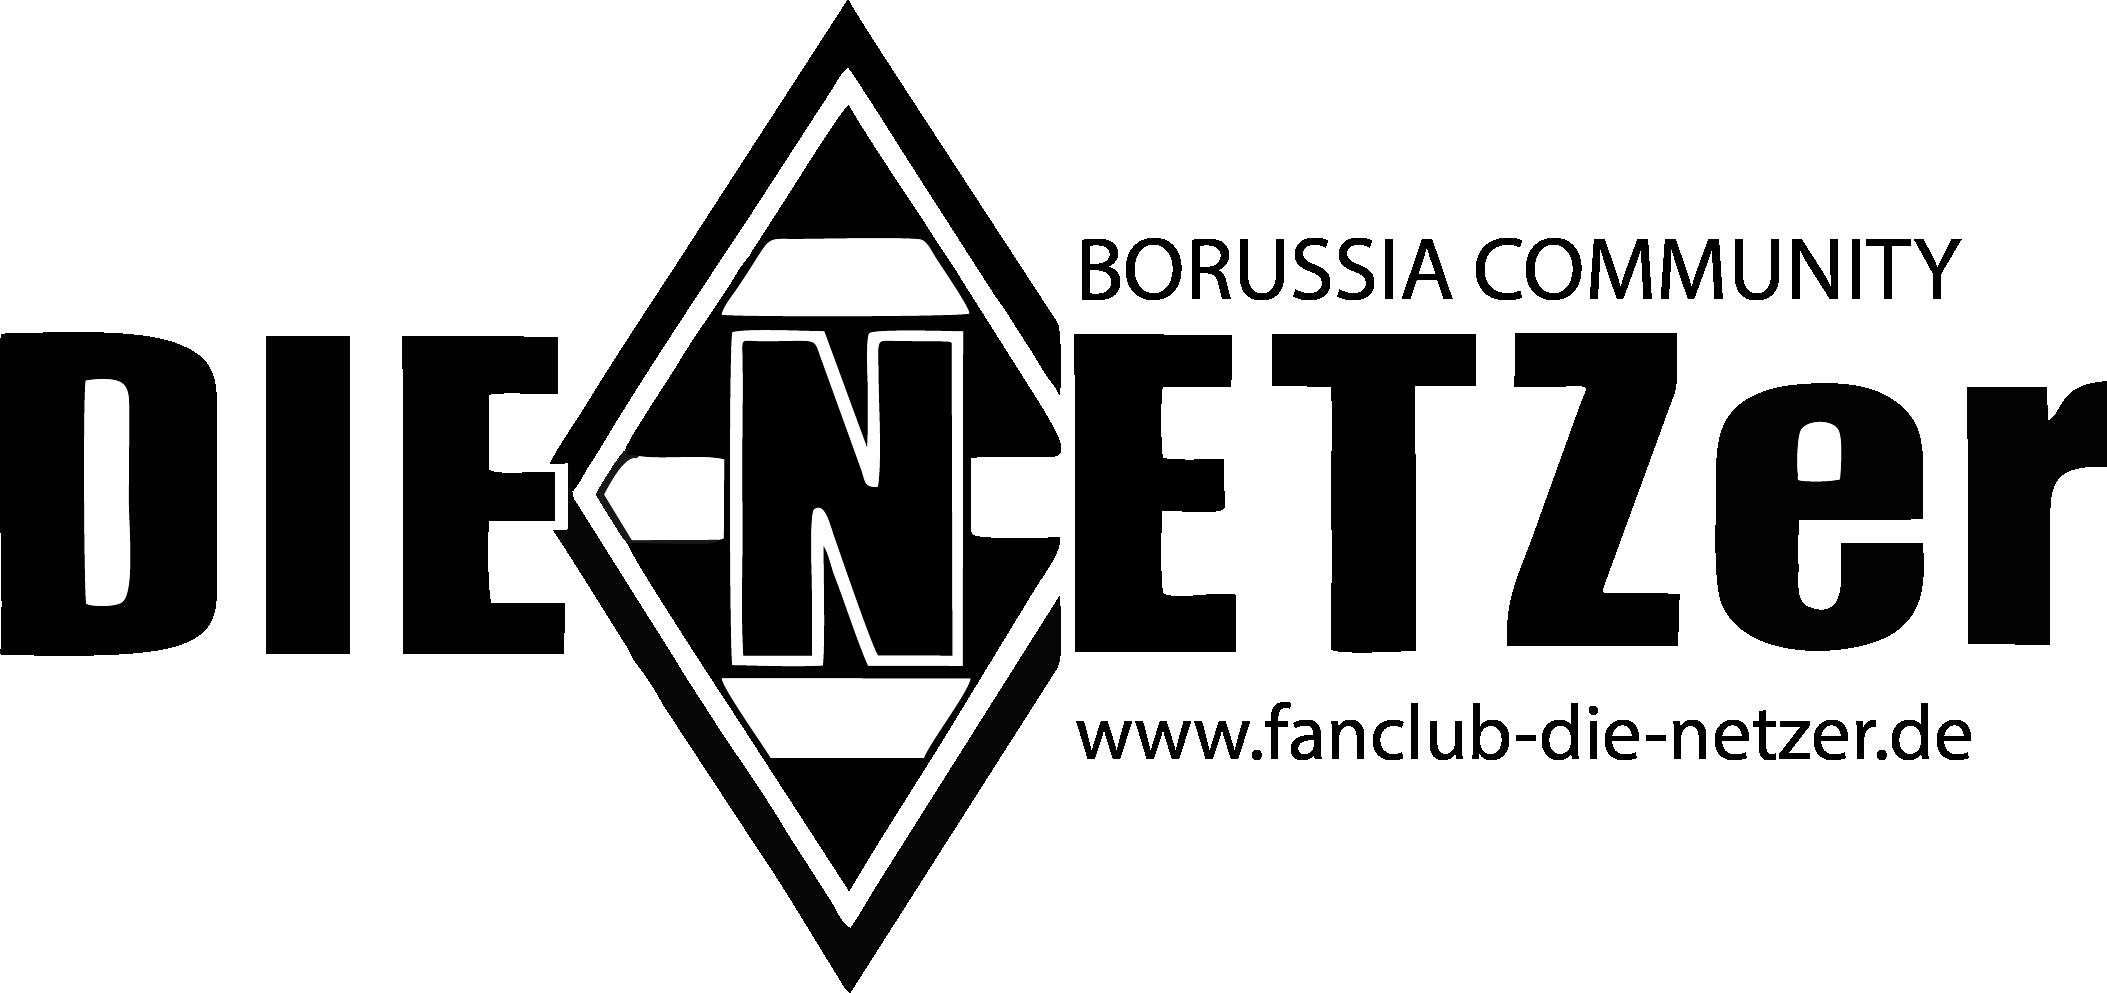 Fanclub Die NETZer – Borussia Community e.V.